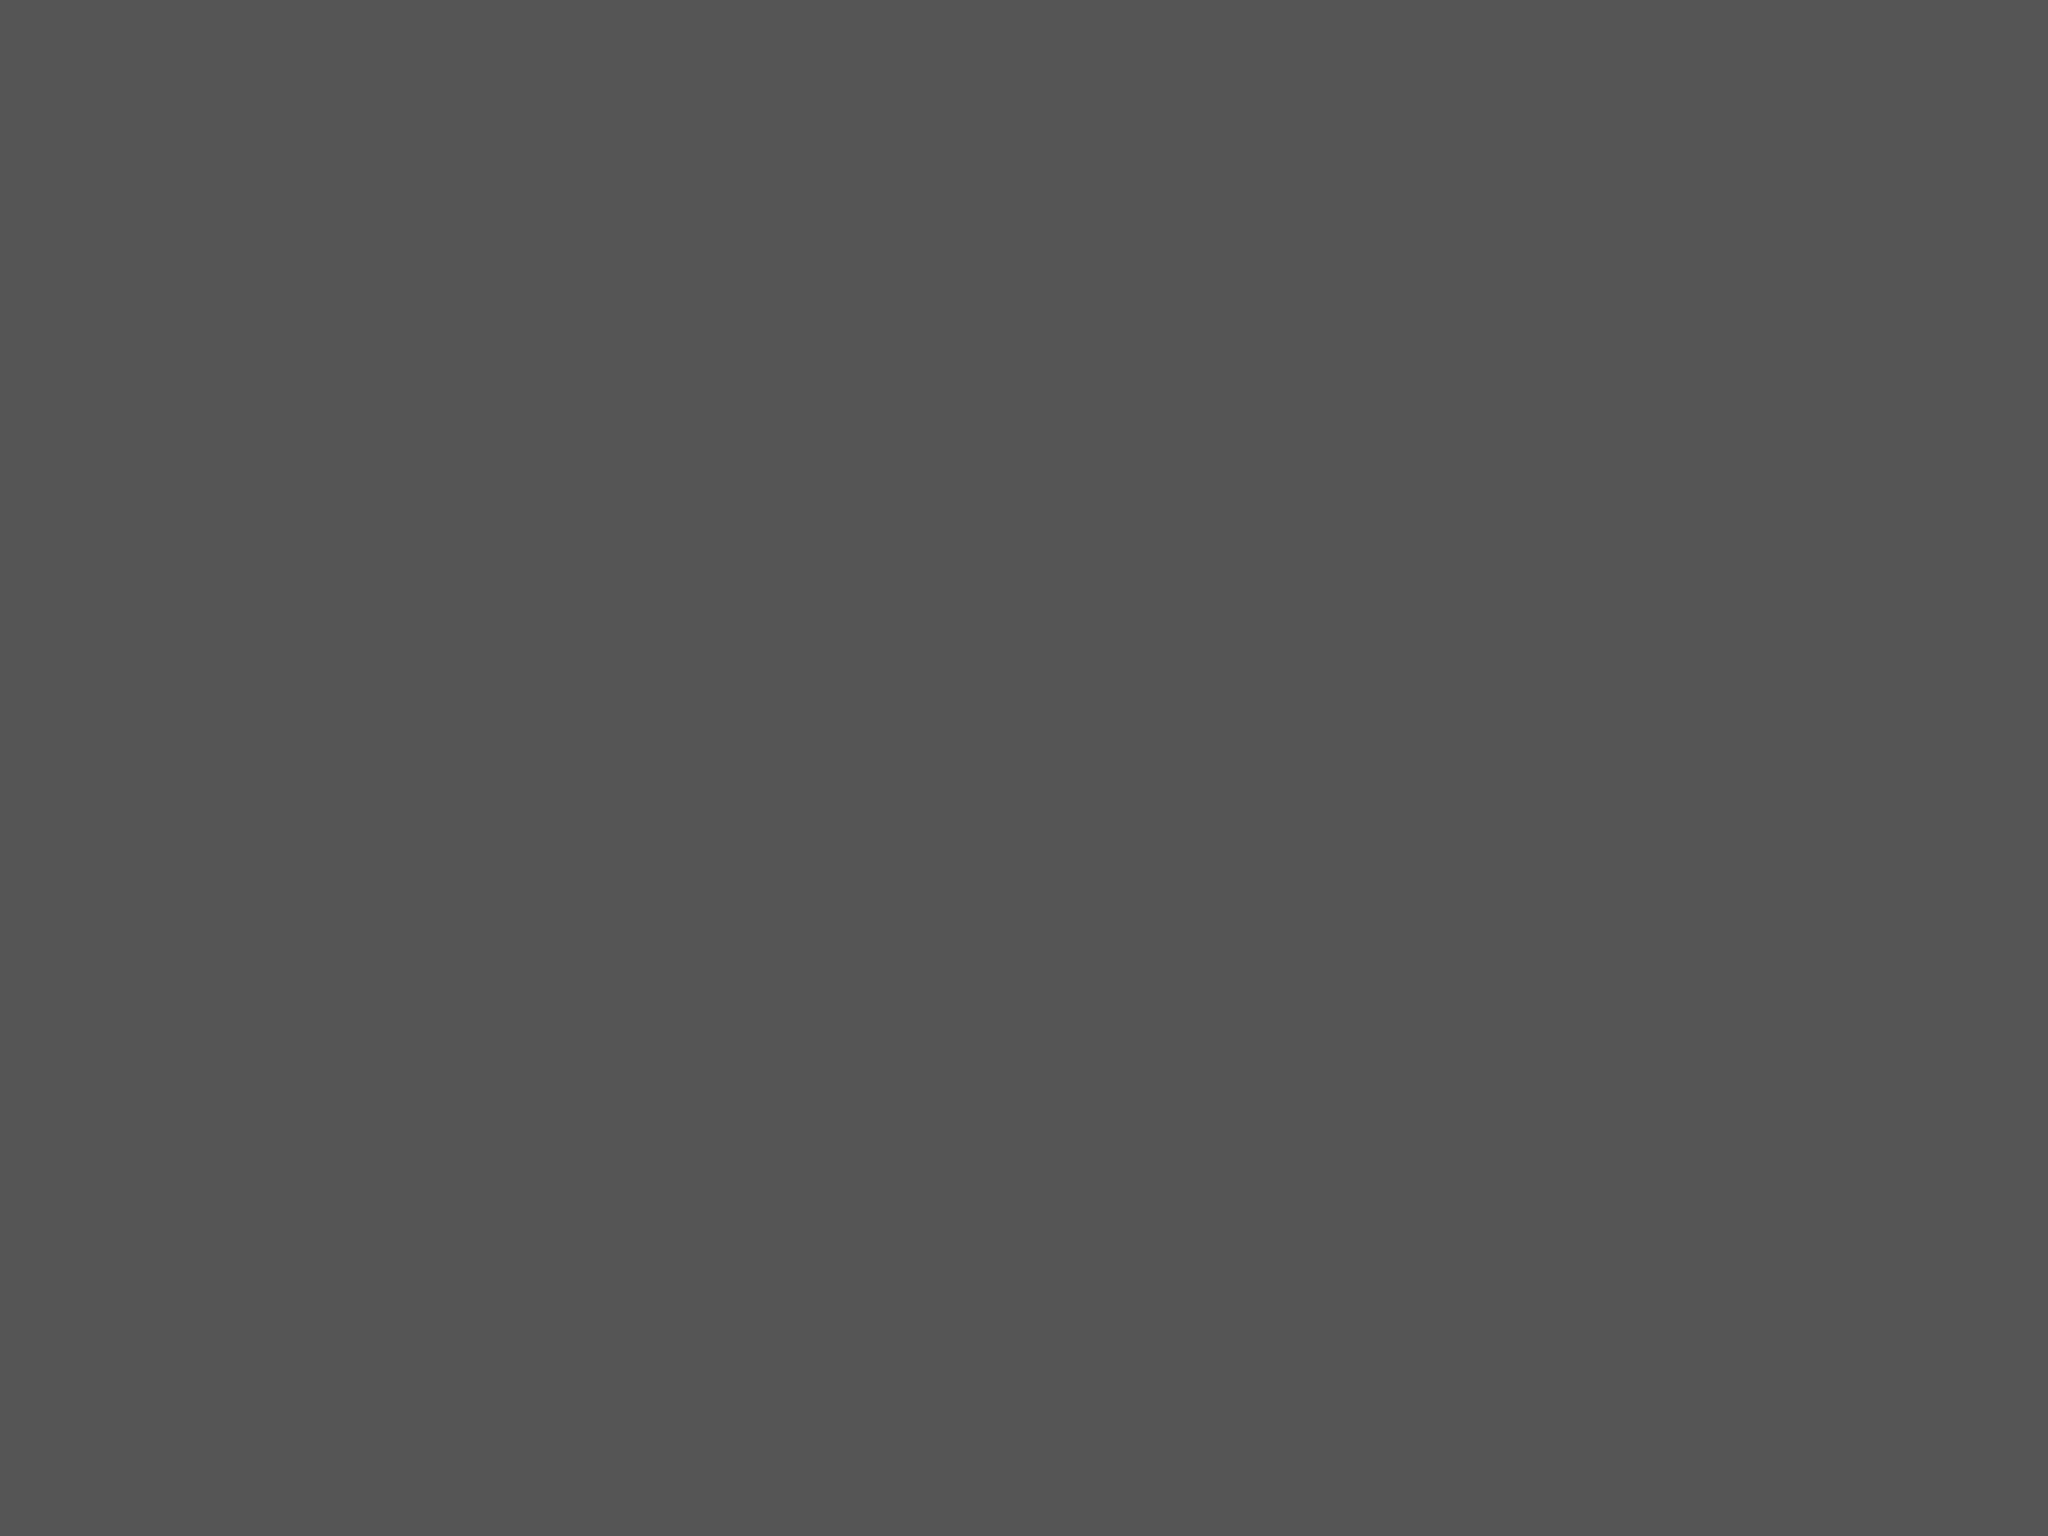 Grey Color Background Solid Color Background